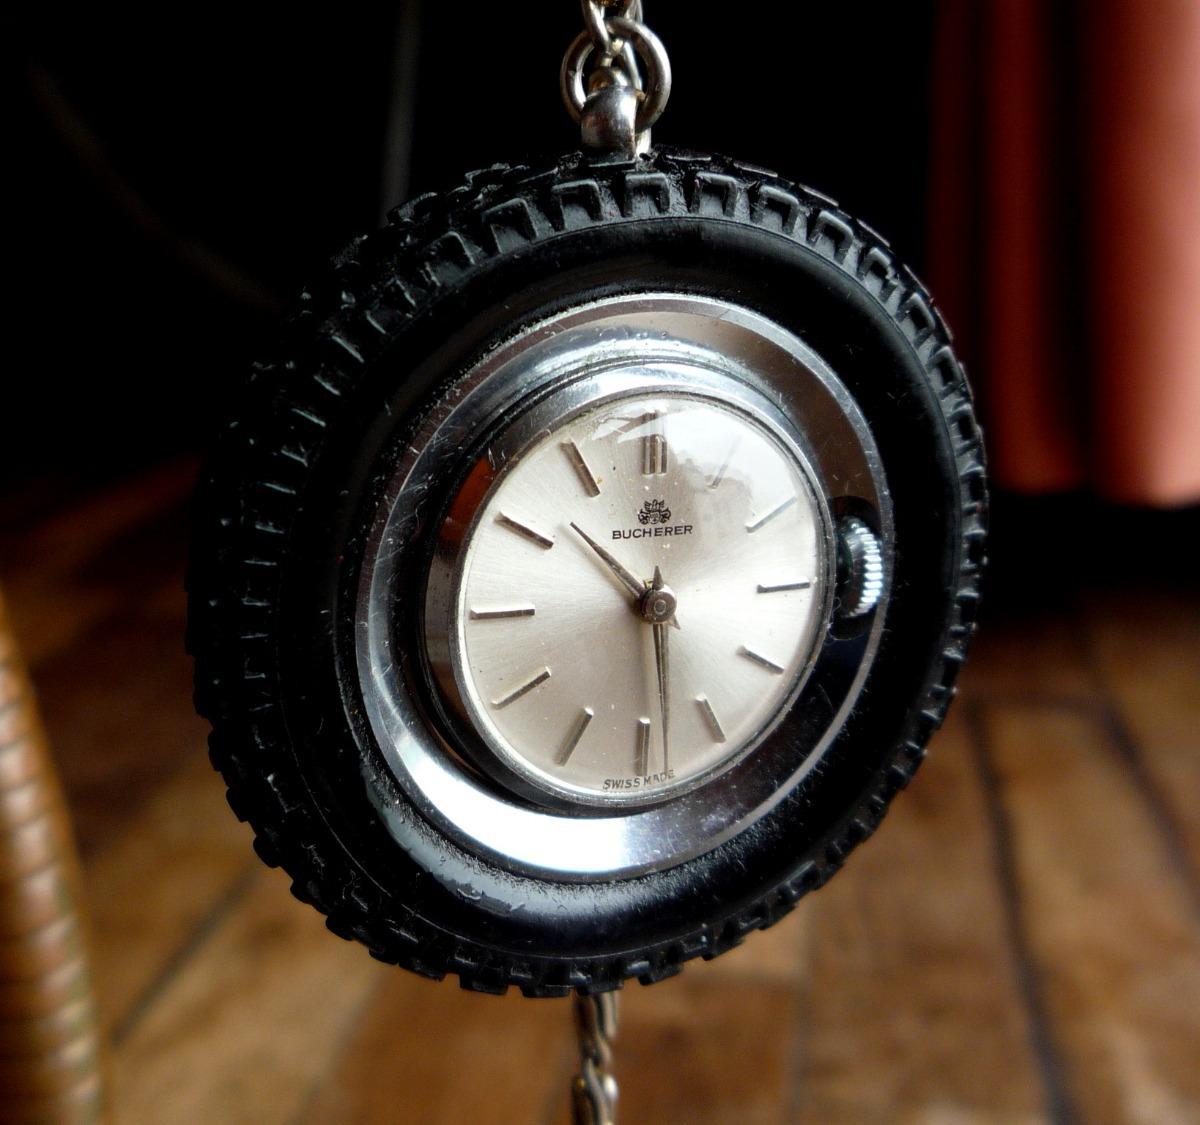 8d7b8fe2a4bb6 Bucherer Reloj Llanta Neumático Suizo Coleccion Rar 14818swt - S ...